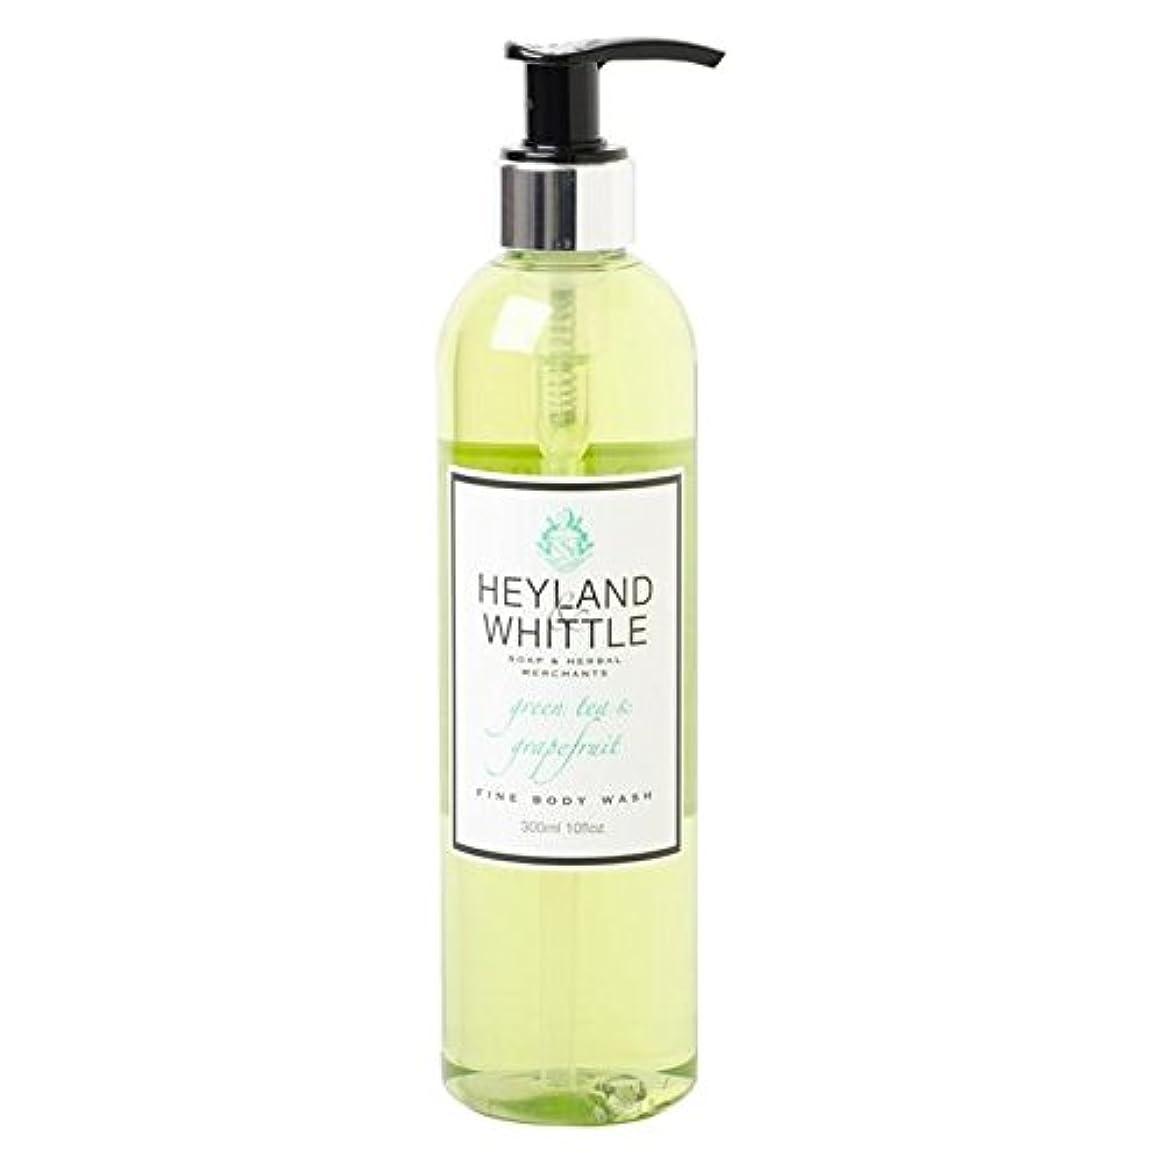 Heyland & Whittle Greentea & Grapefruit Body Wash 300ml - &削るグリーンティ&グレープフルーツボディウォッシュ300ミリリットル [並行輸入品]